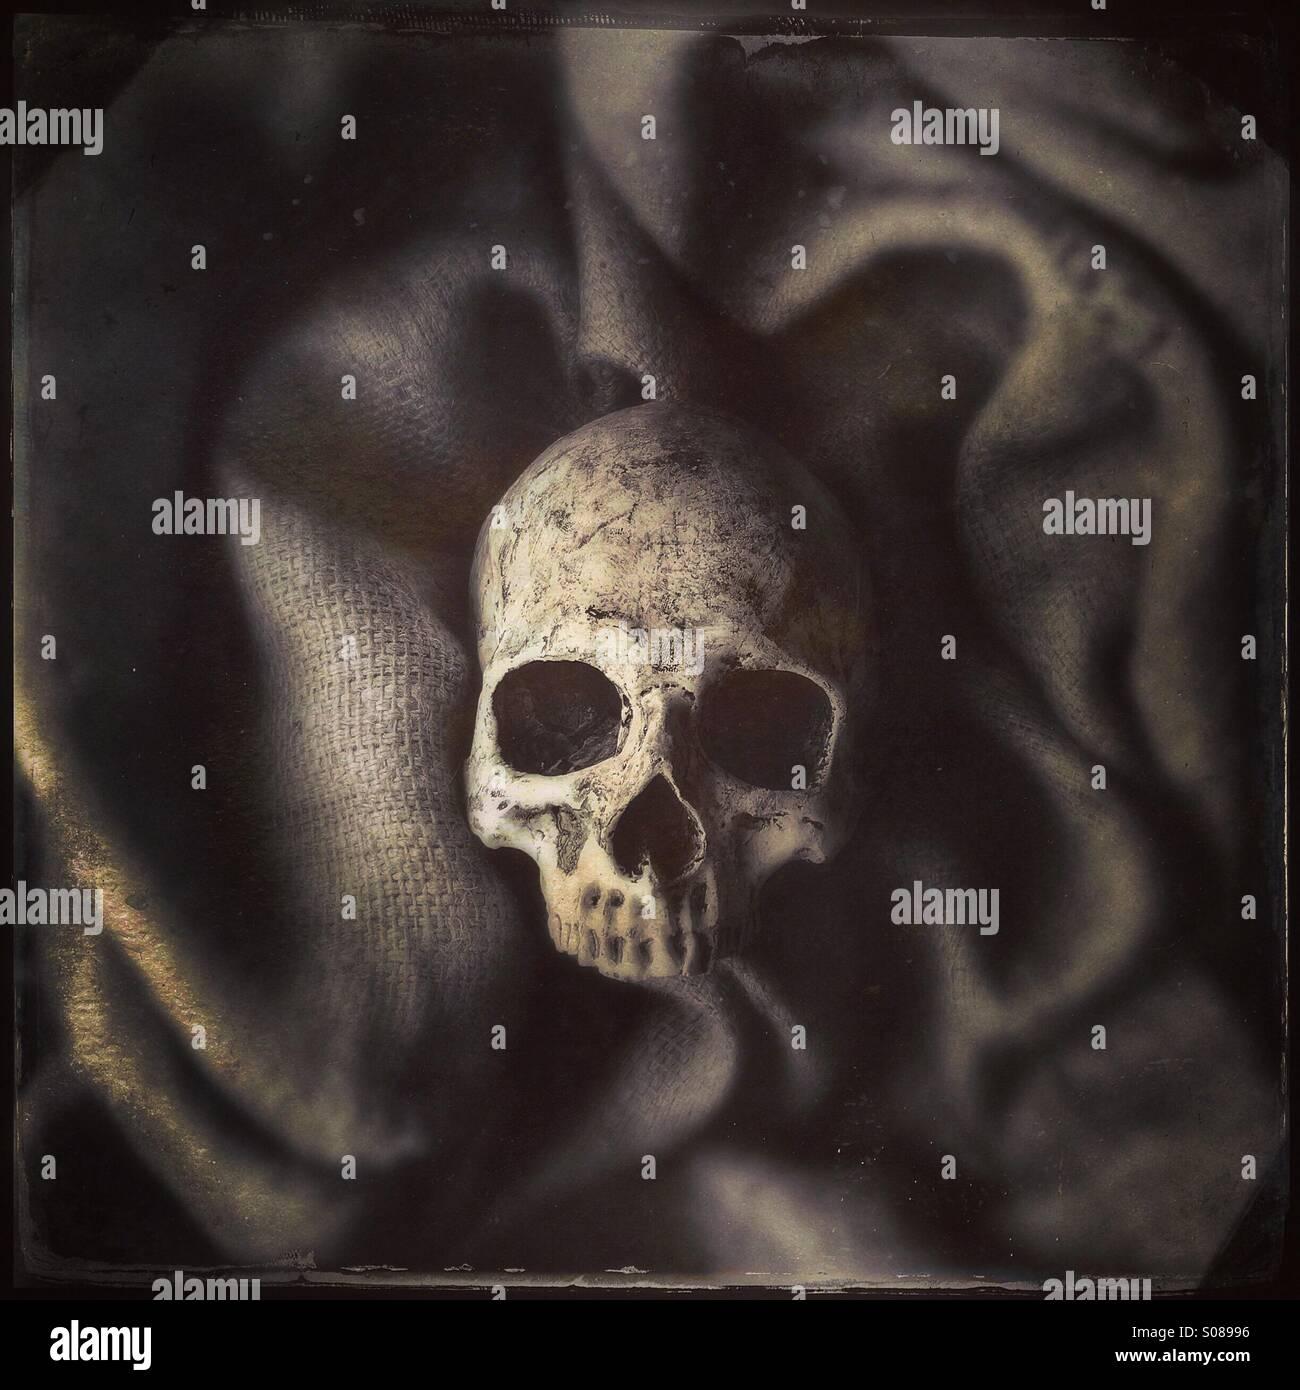 Cranio umano circondato da tela ruvida Immagini Stock